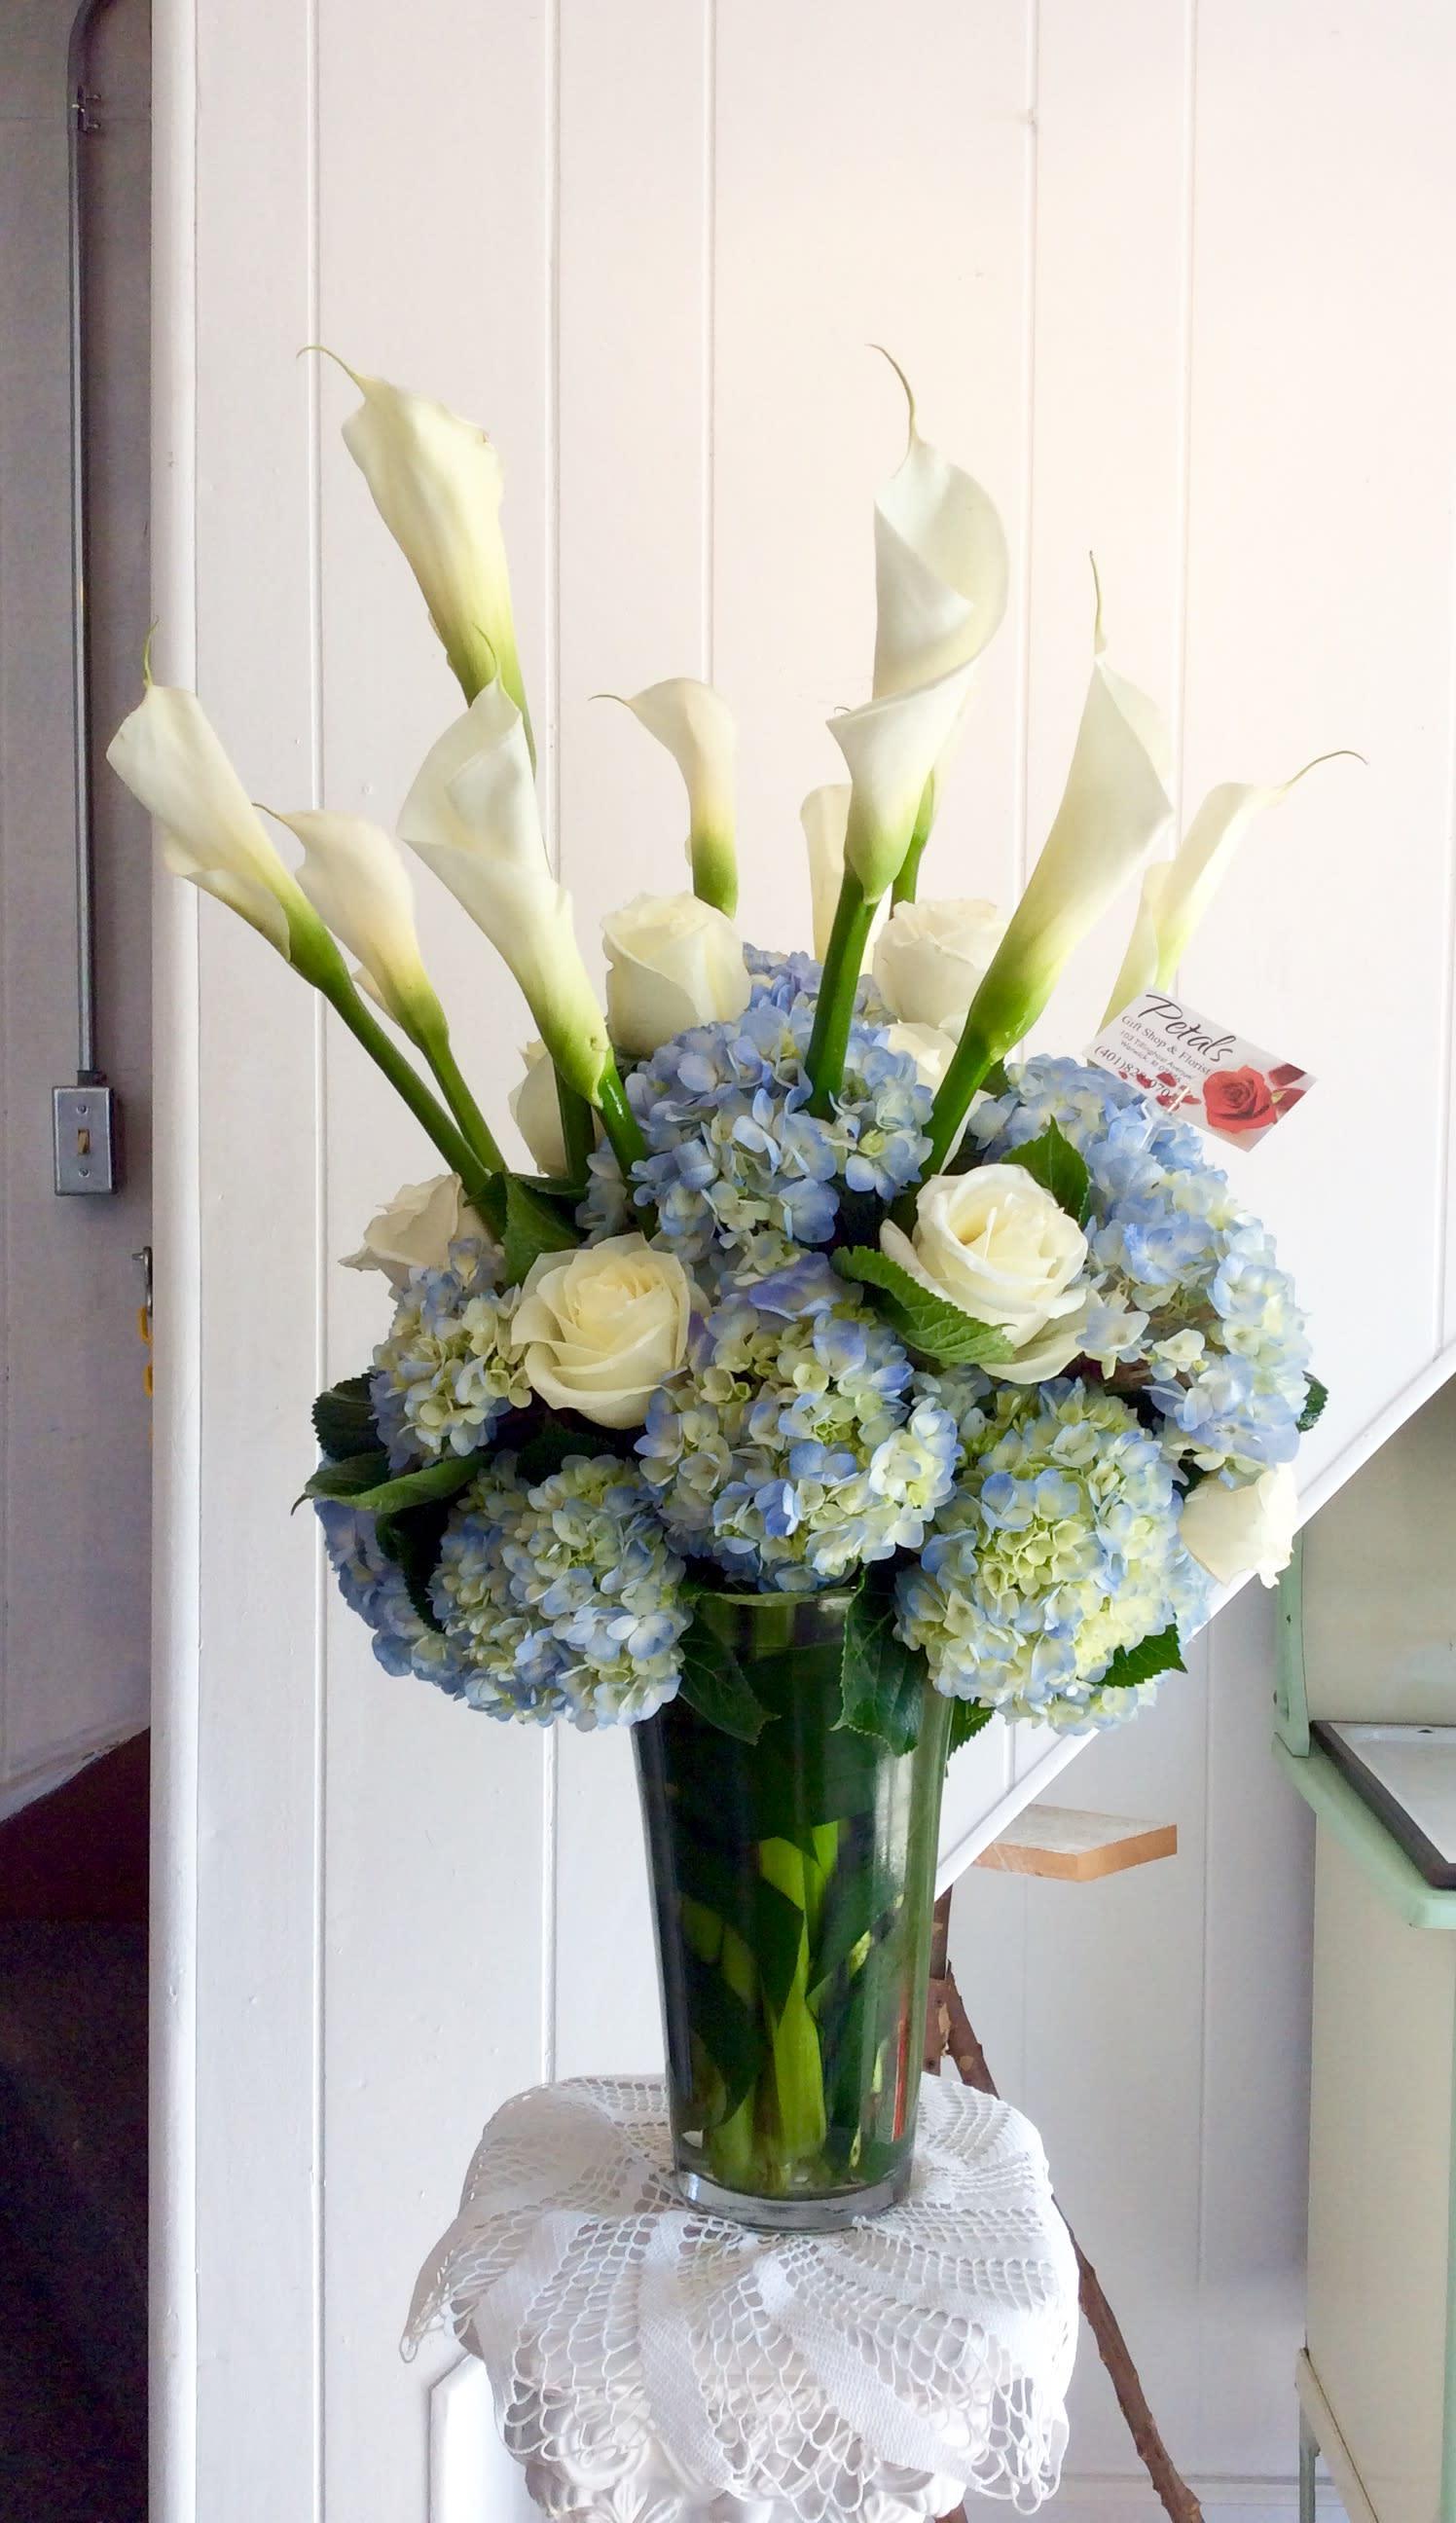 Awe Inspiring Tall Vase Of White Cala Lillies Roses And Hydrangeas In Warwick Ri Petals Florist Gift Shop